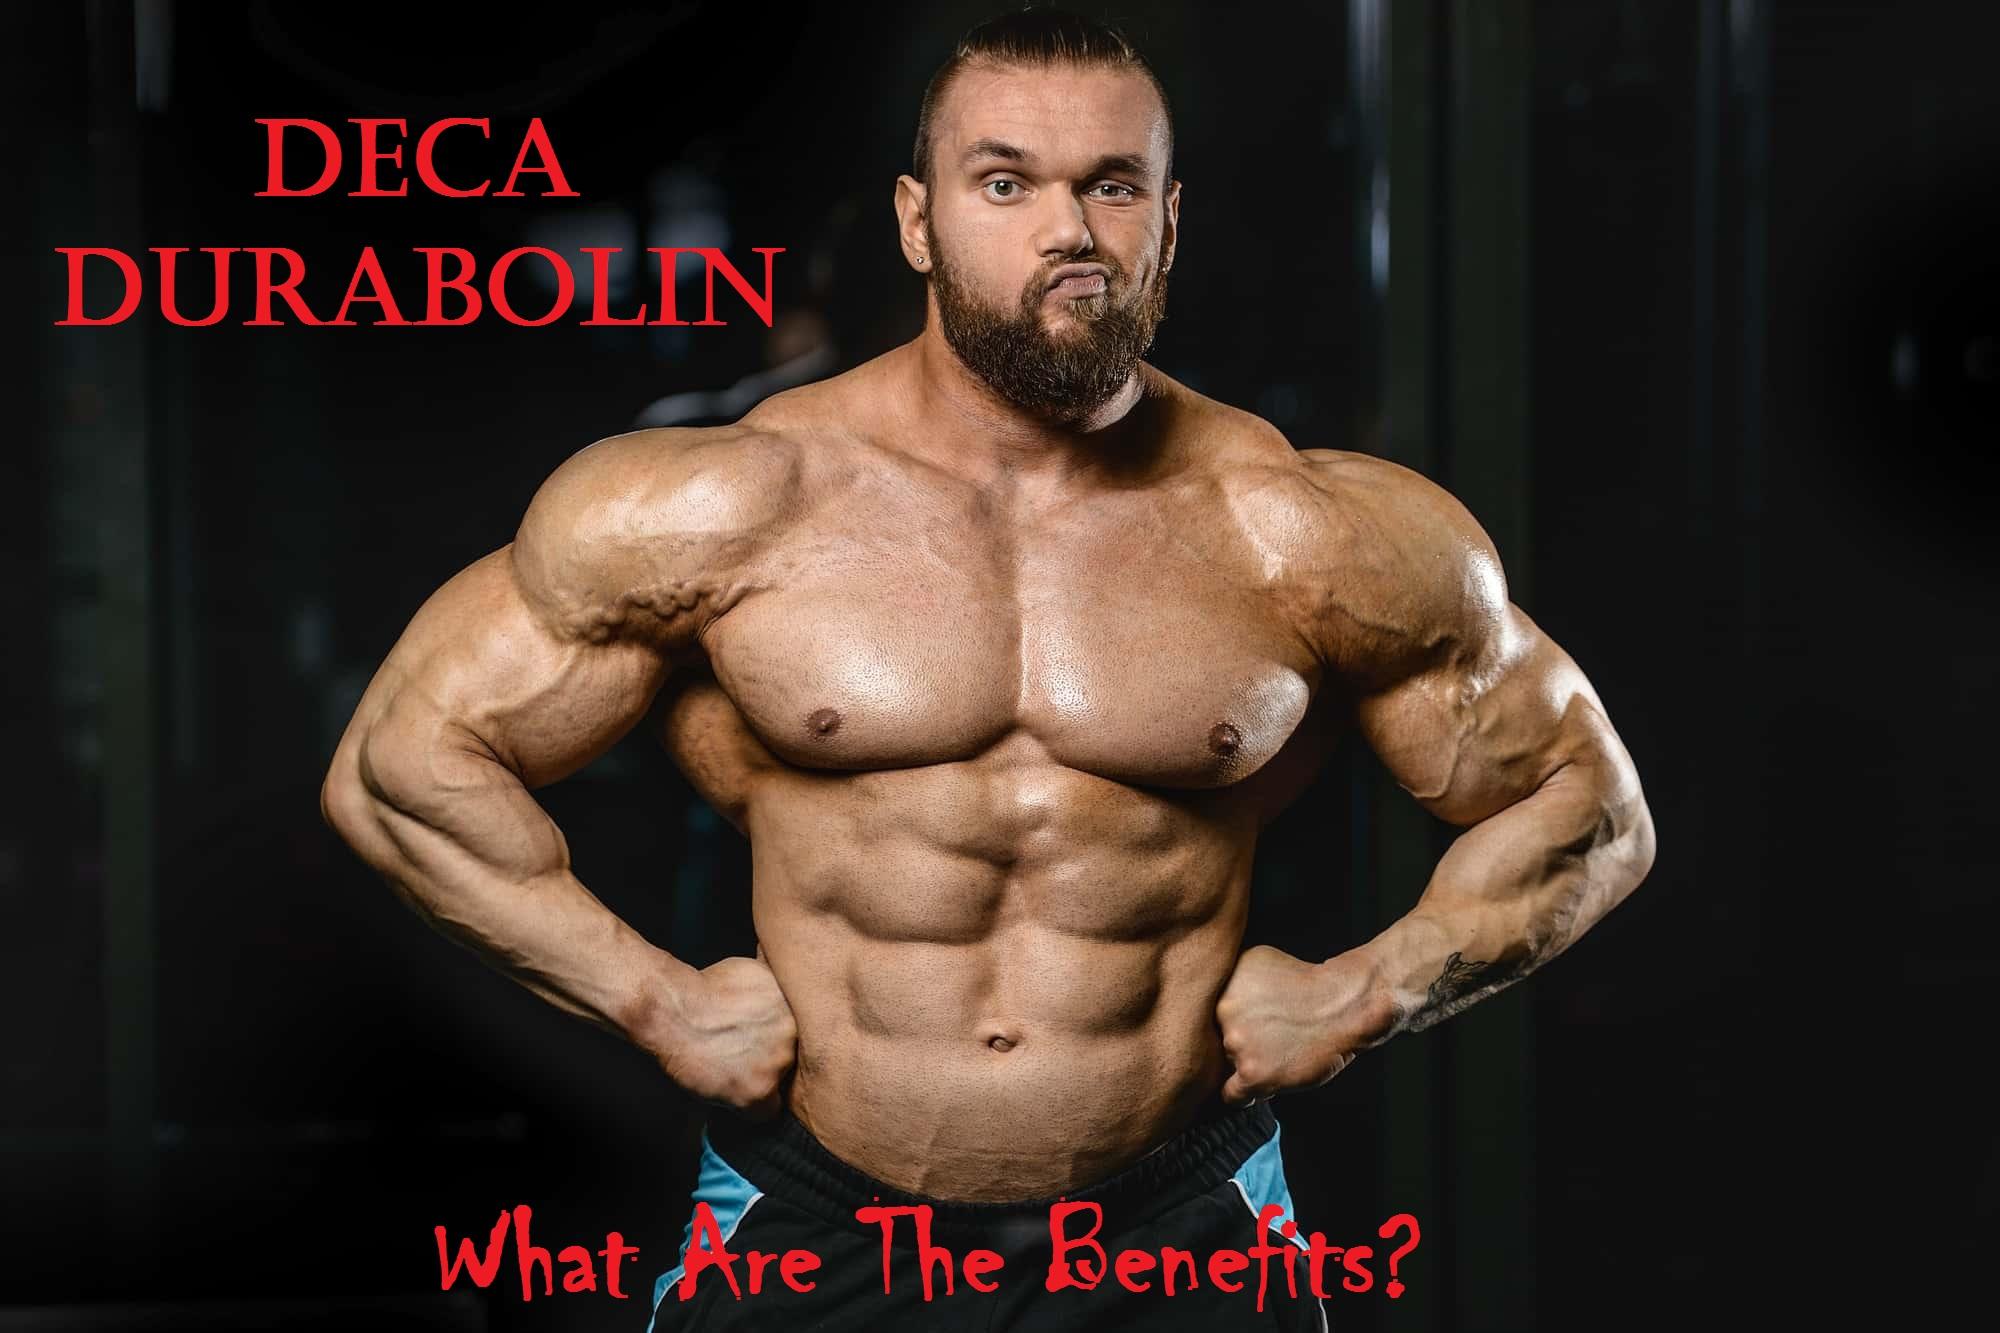 deca-durabolin-benefits